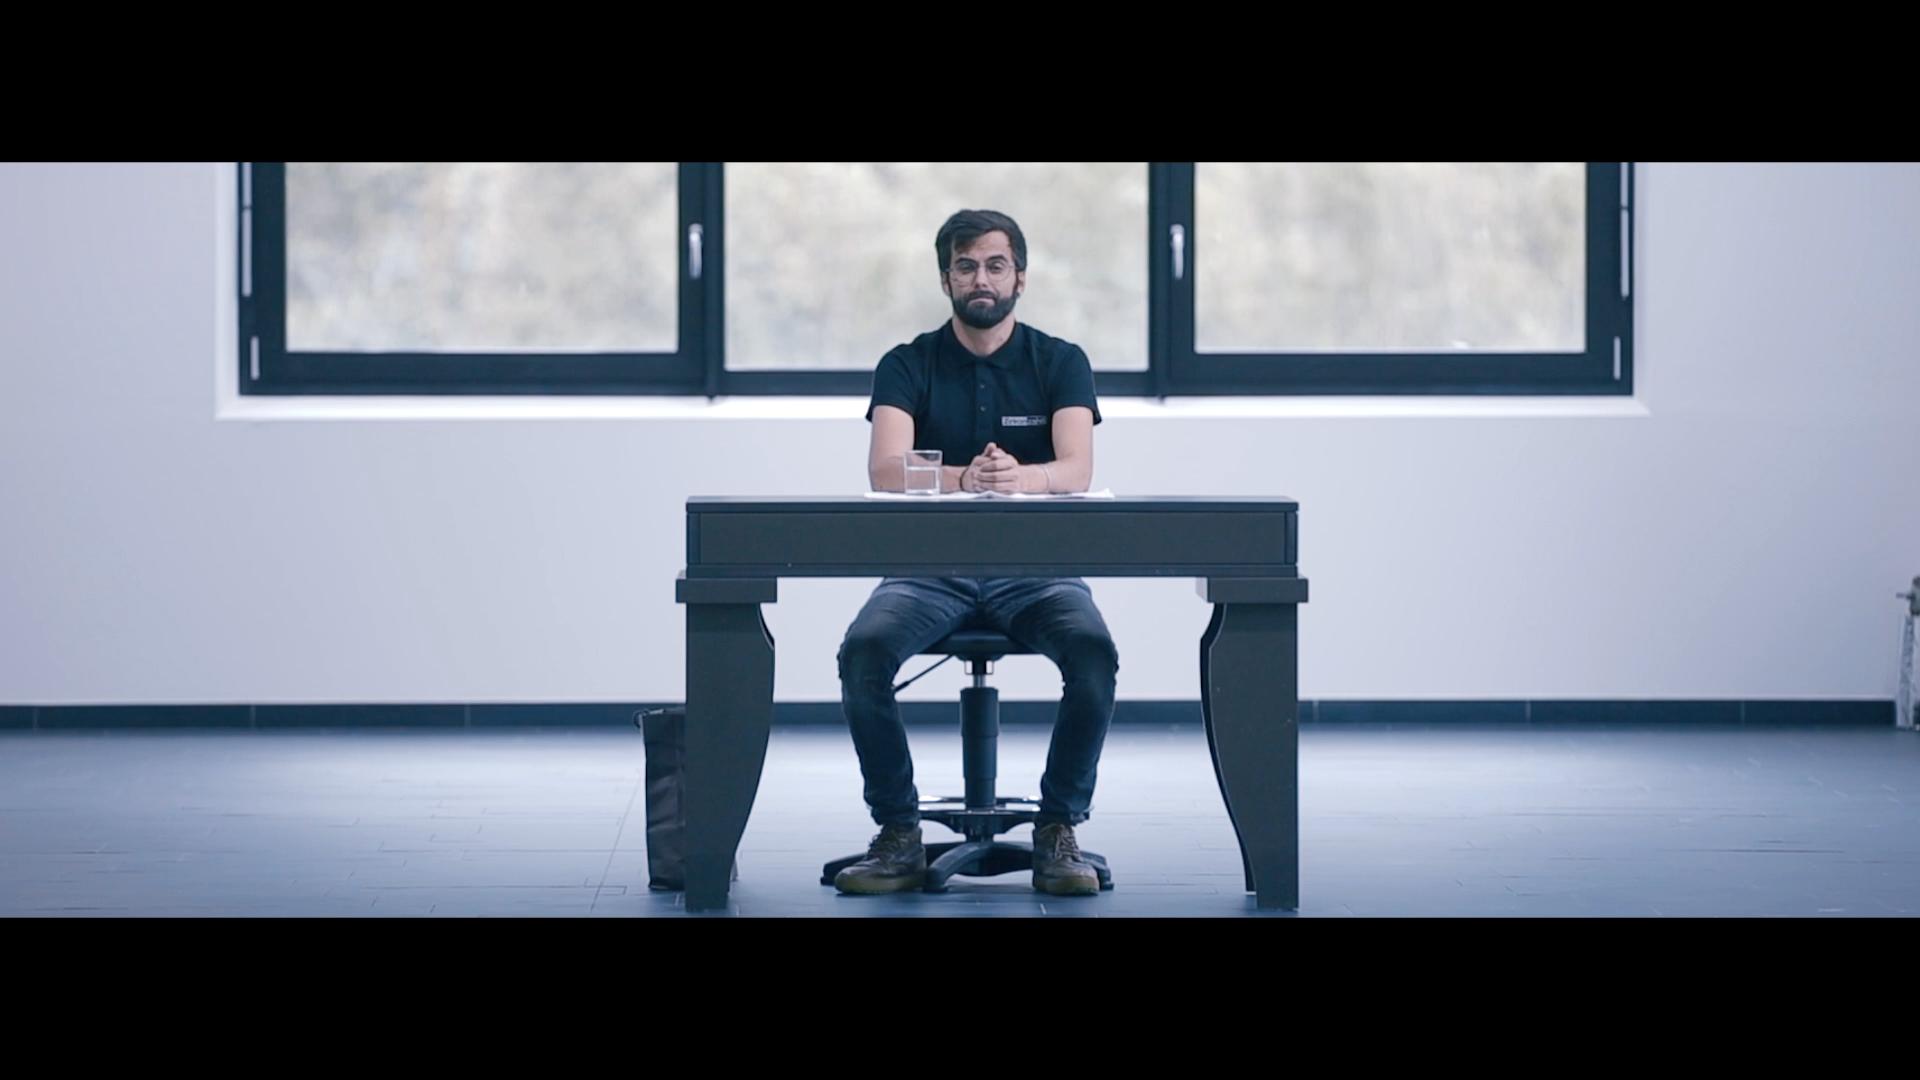 Freeze-frame from ZirkonZahn video